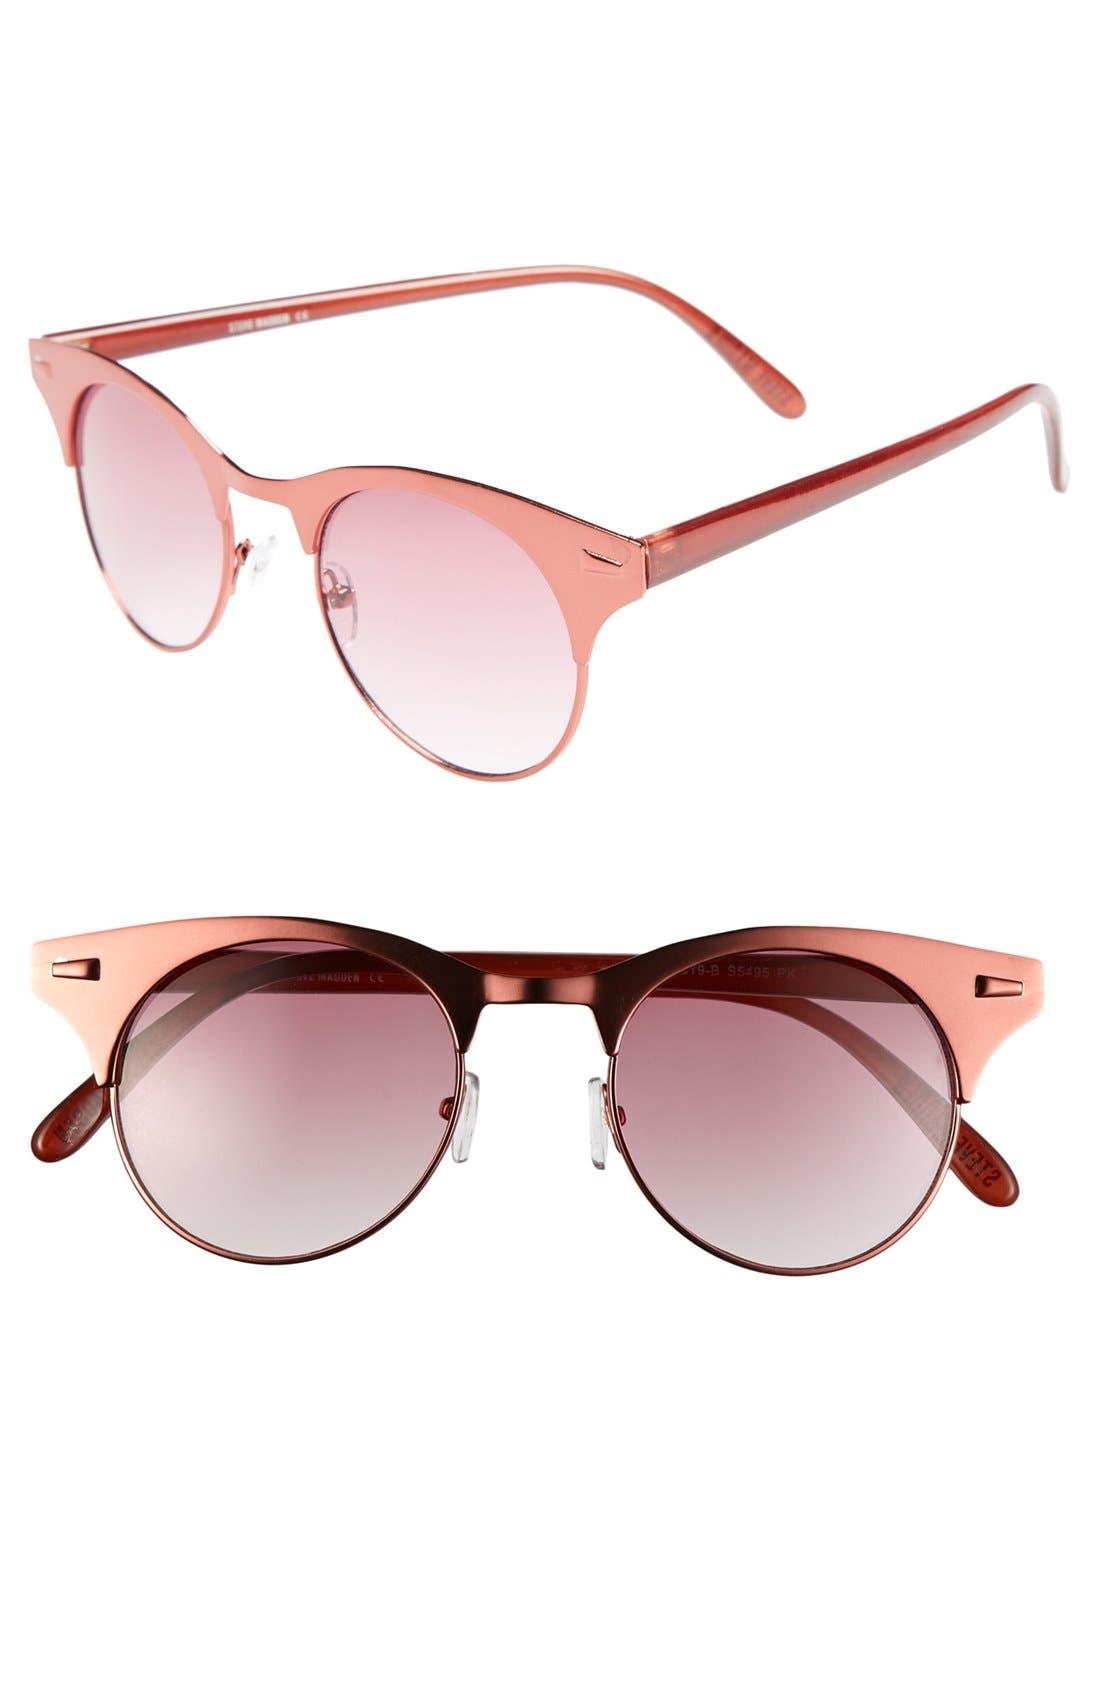 Alternate Image 1 Selected - Steve Madden 49mm Retro Metal Sunglasses